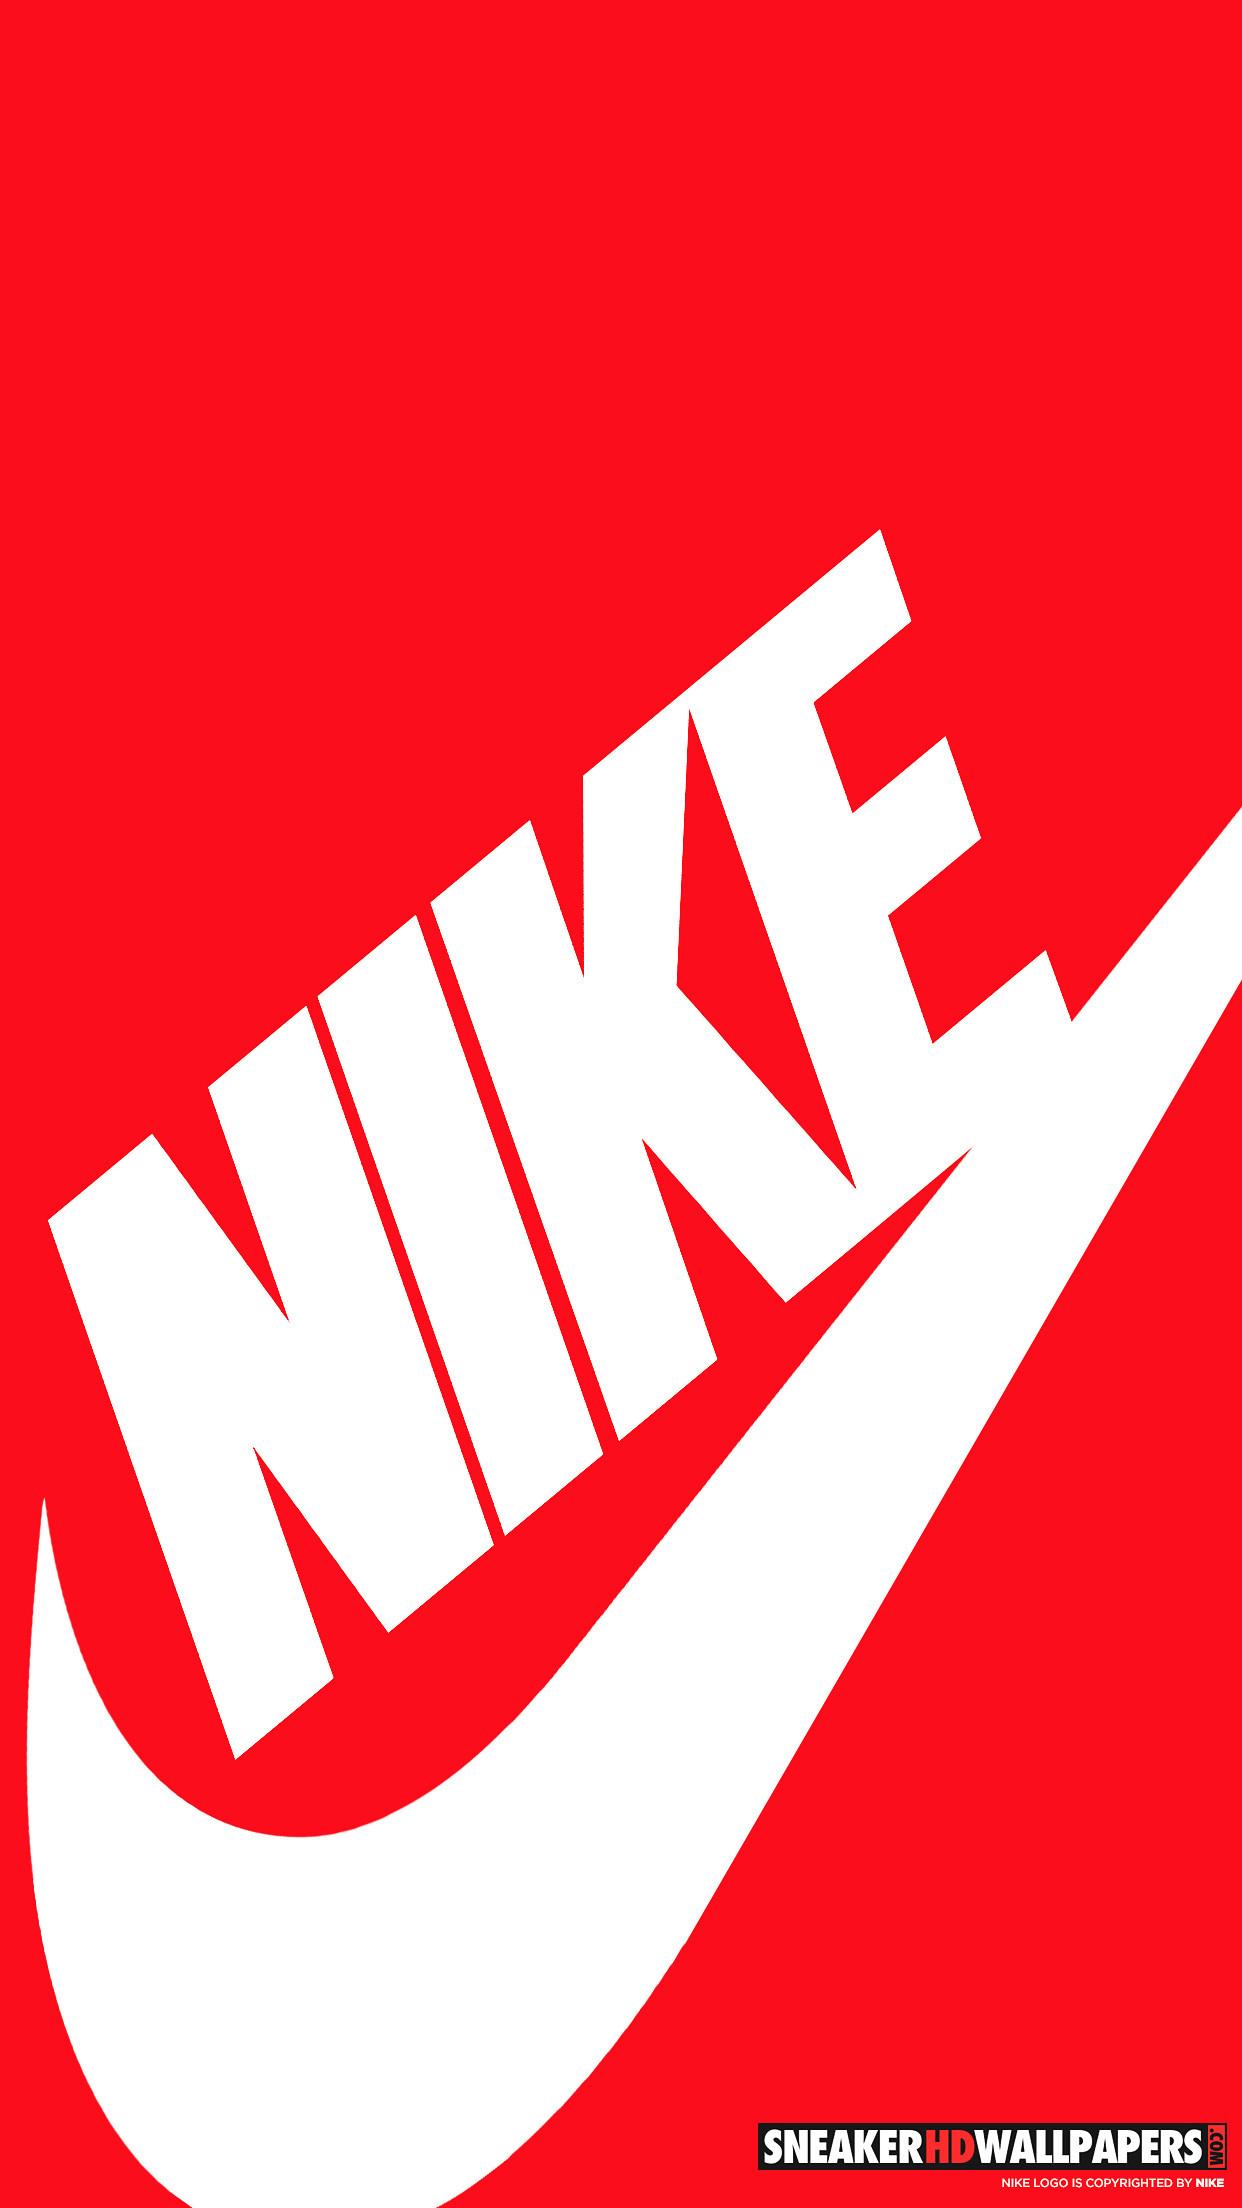 1920x1080 Hd Wallpaper Air Jordan Shoes Collection 1280x1024PX